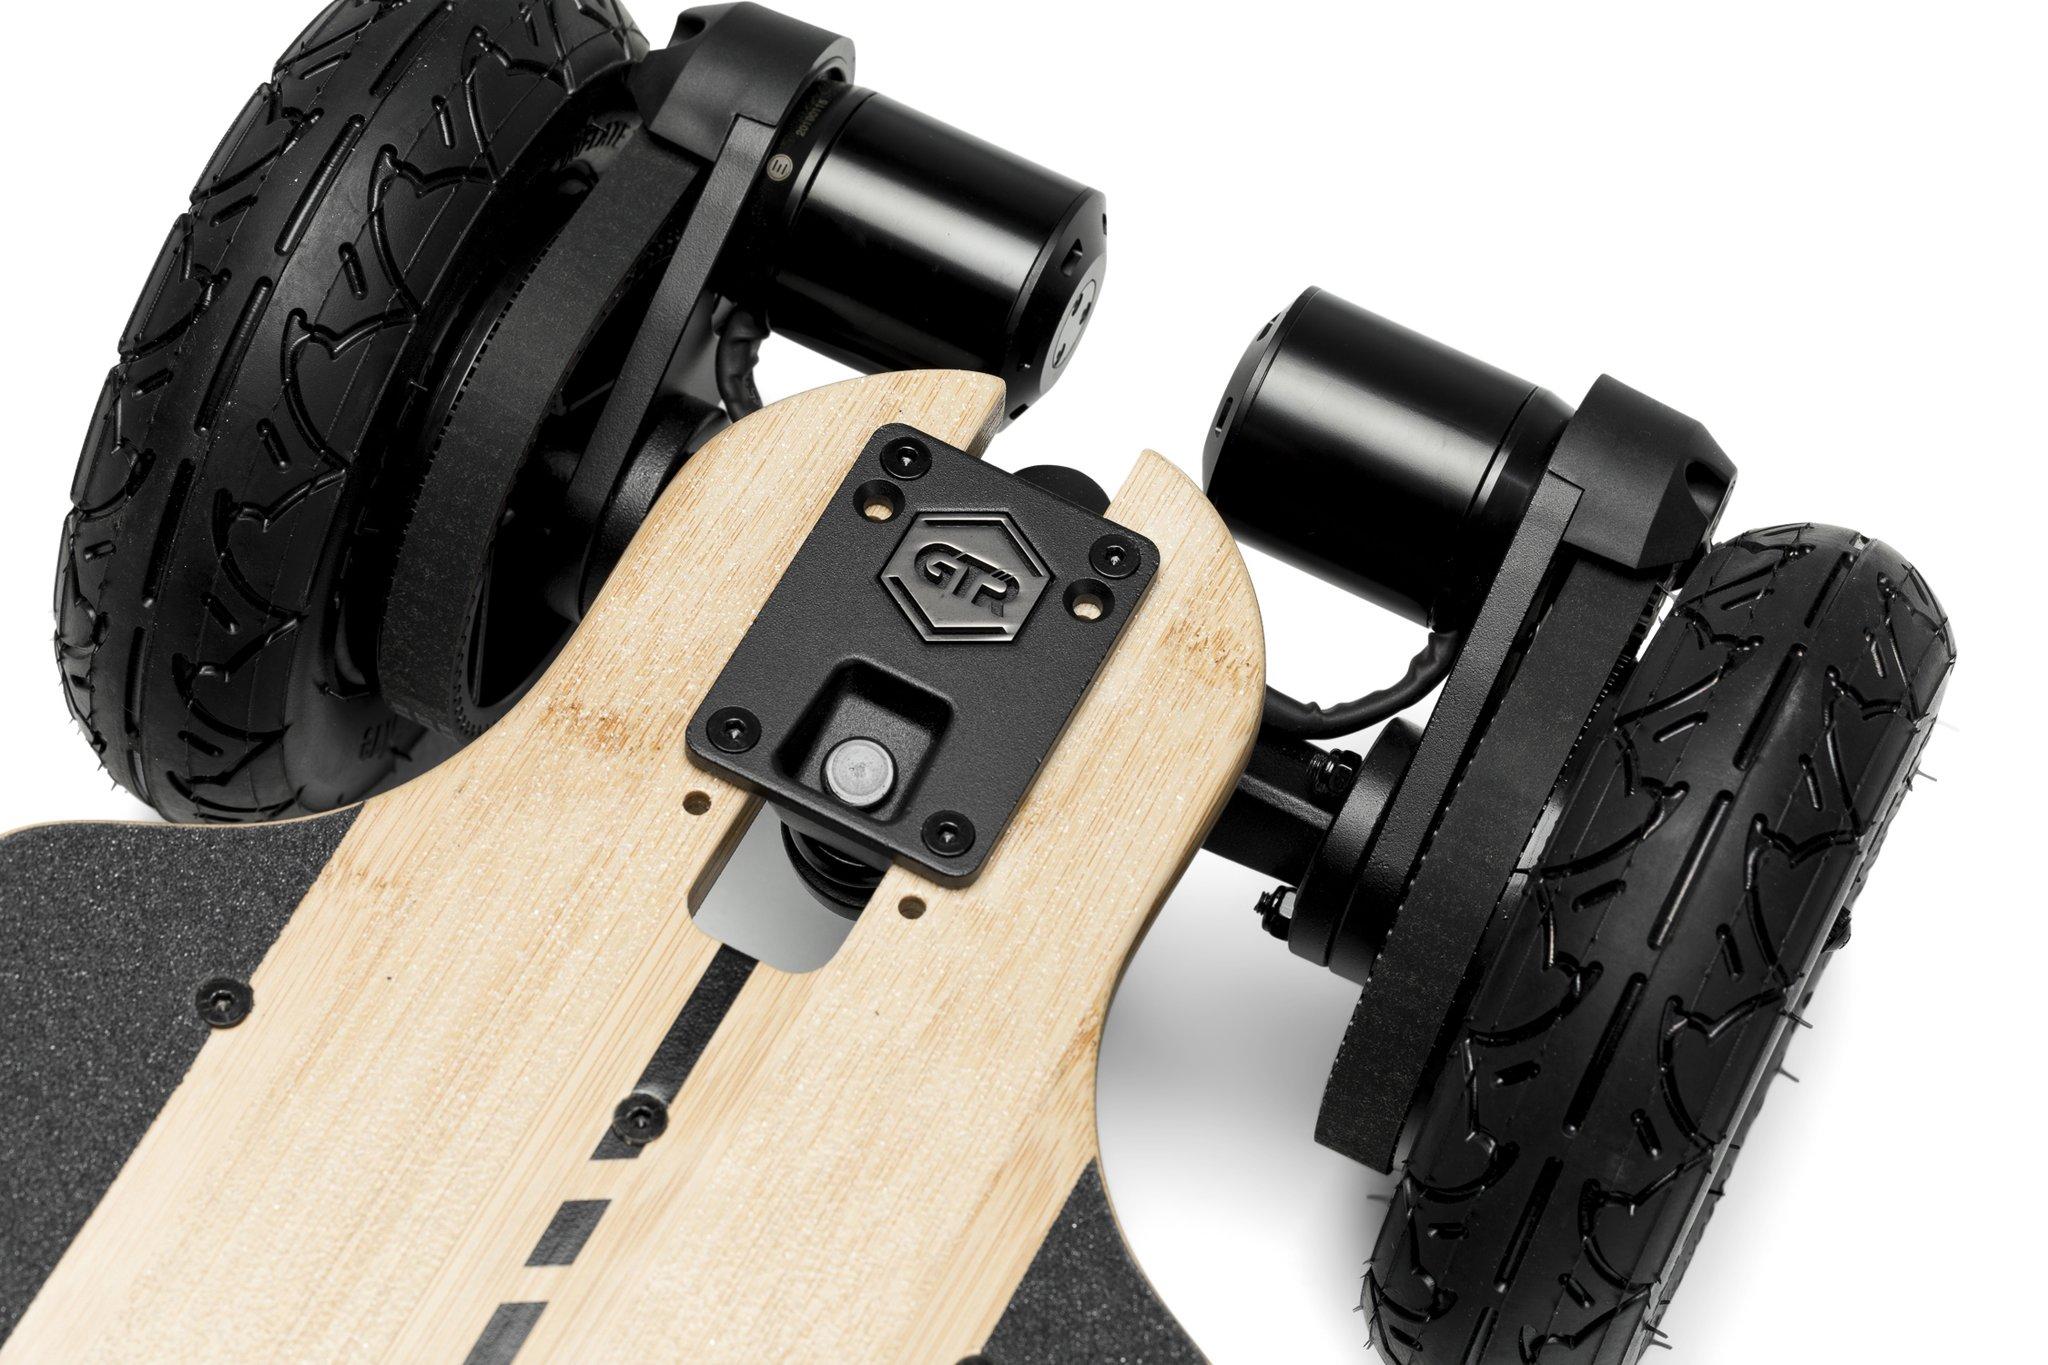 Evolve GTR Bamboo All Terrain e-Skateboard